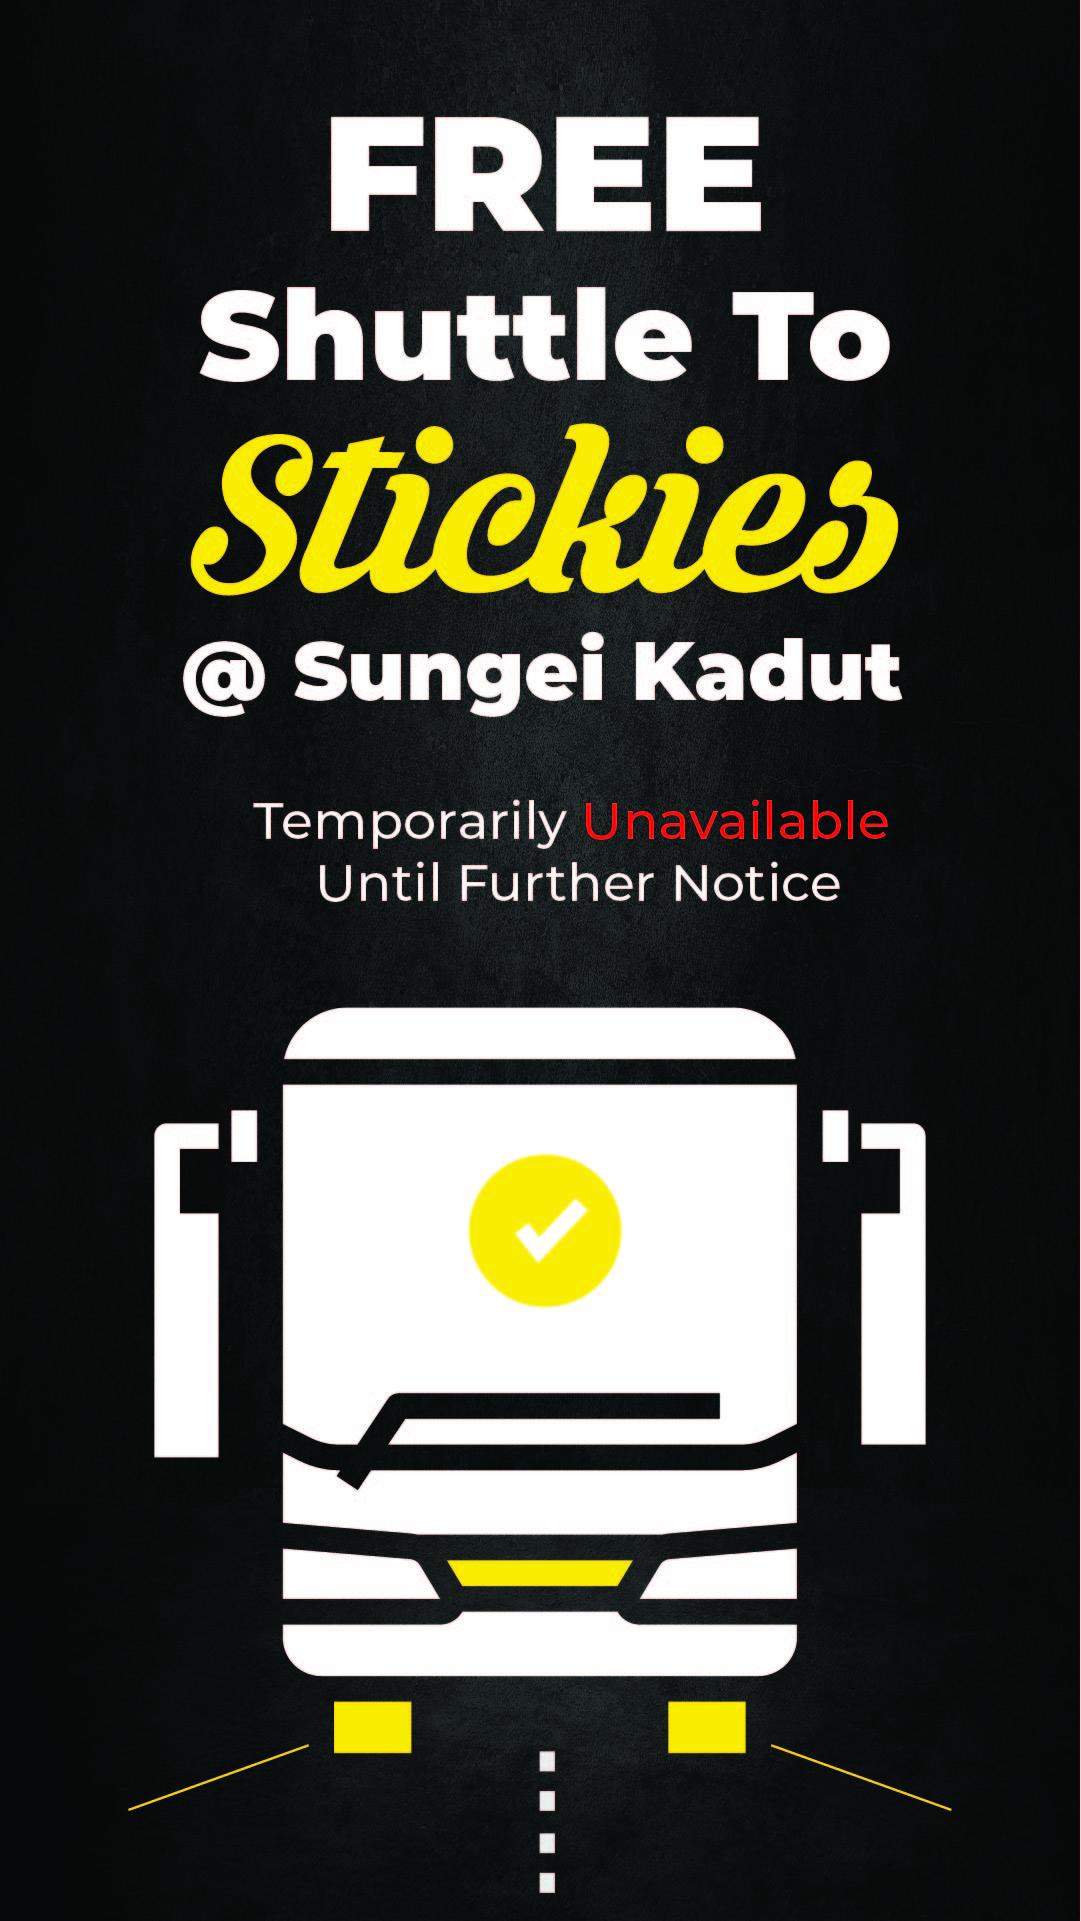 Stickies Sungei Kadut Free Shuttle